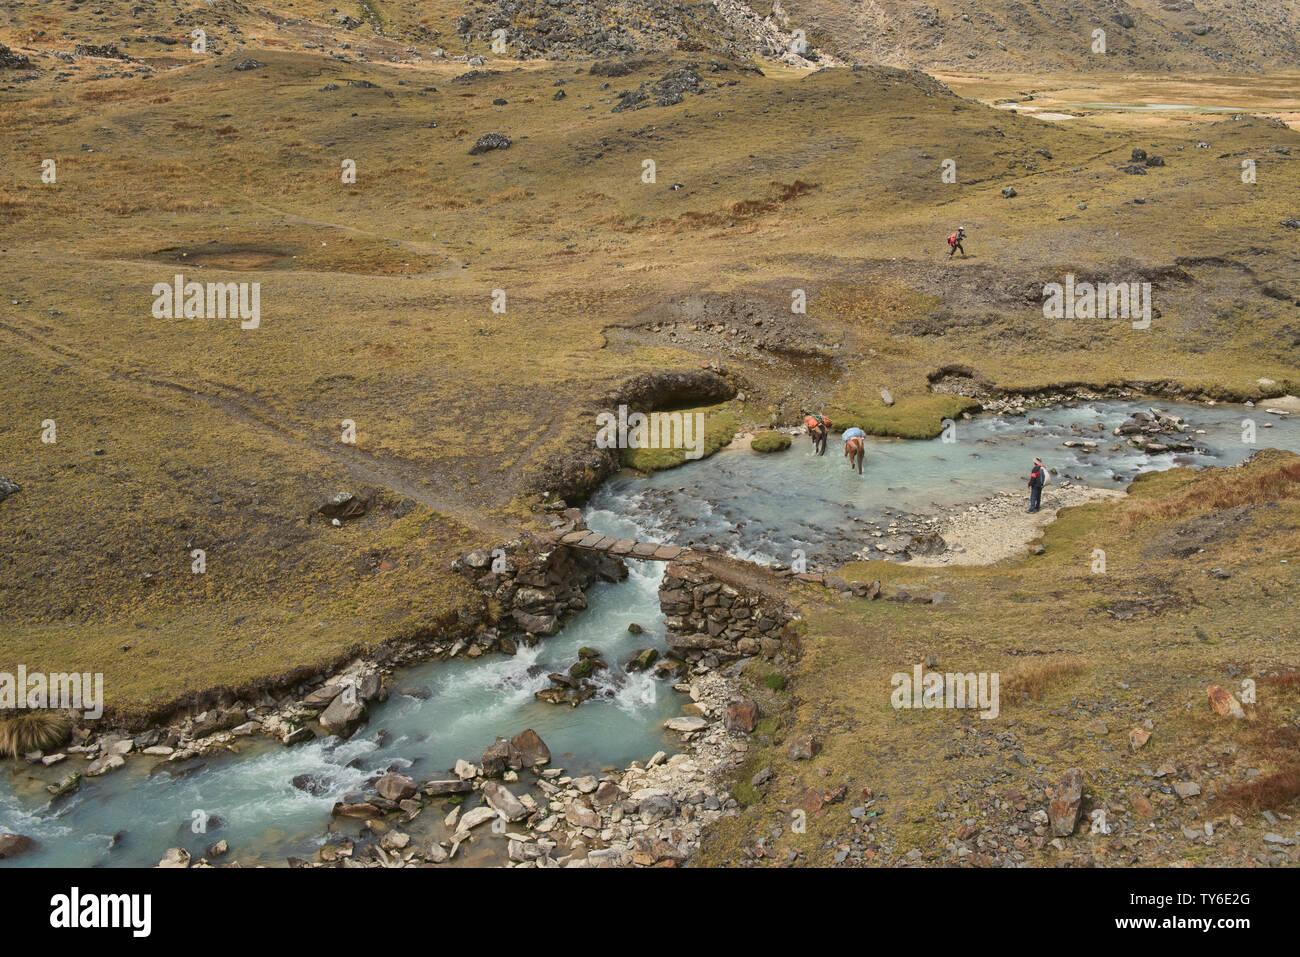 Horses crossing the Chacolpaya River, Cordillera Real Traverse, Bolivia Stock Photo